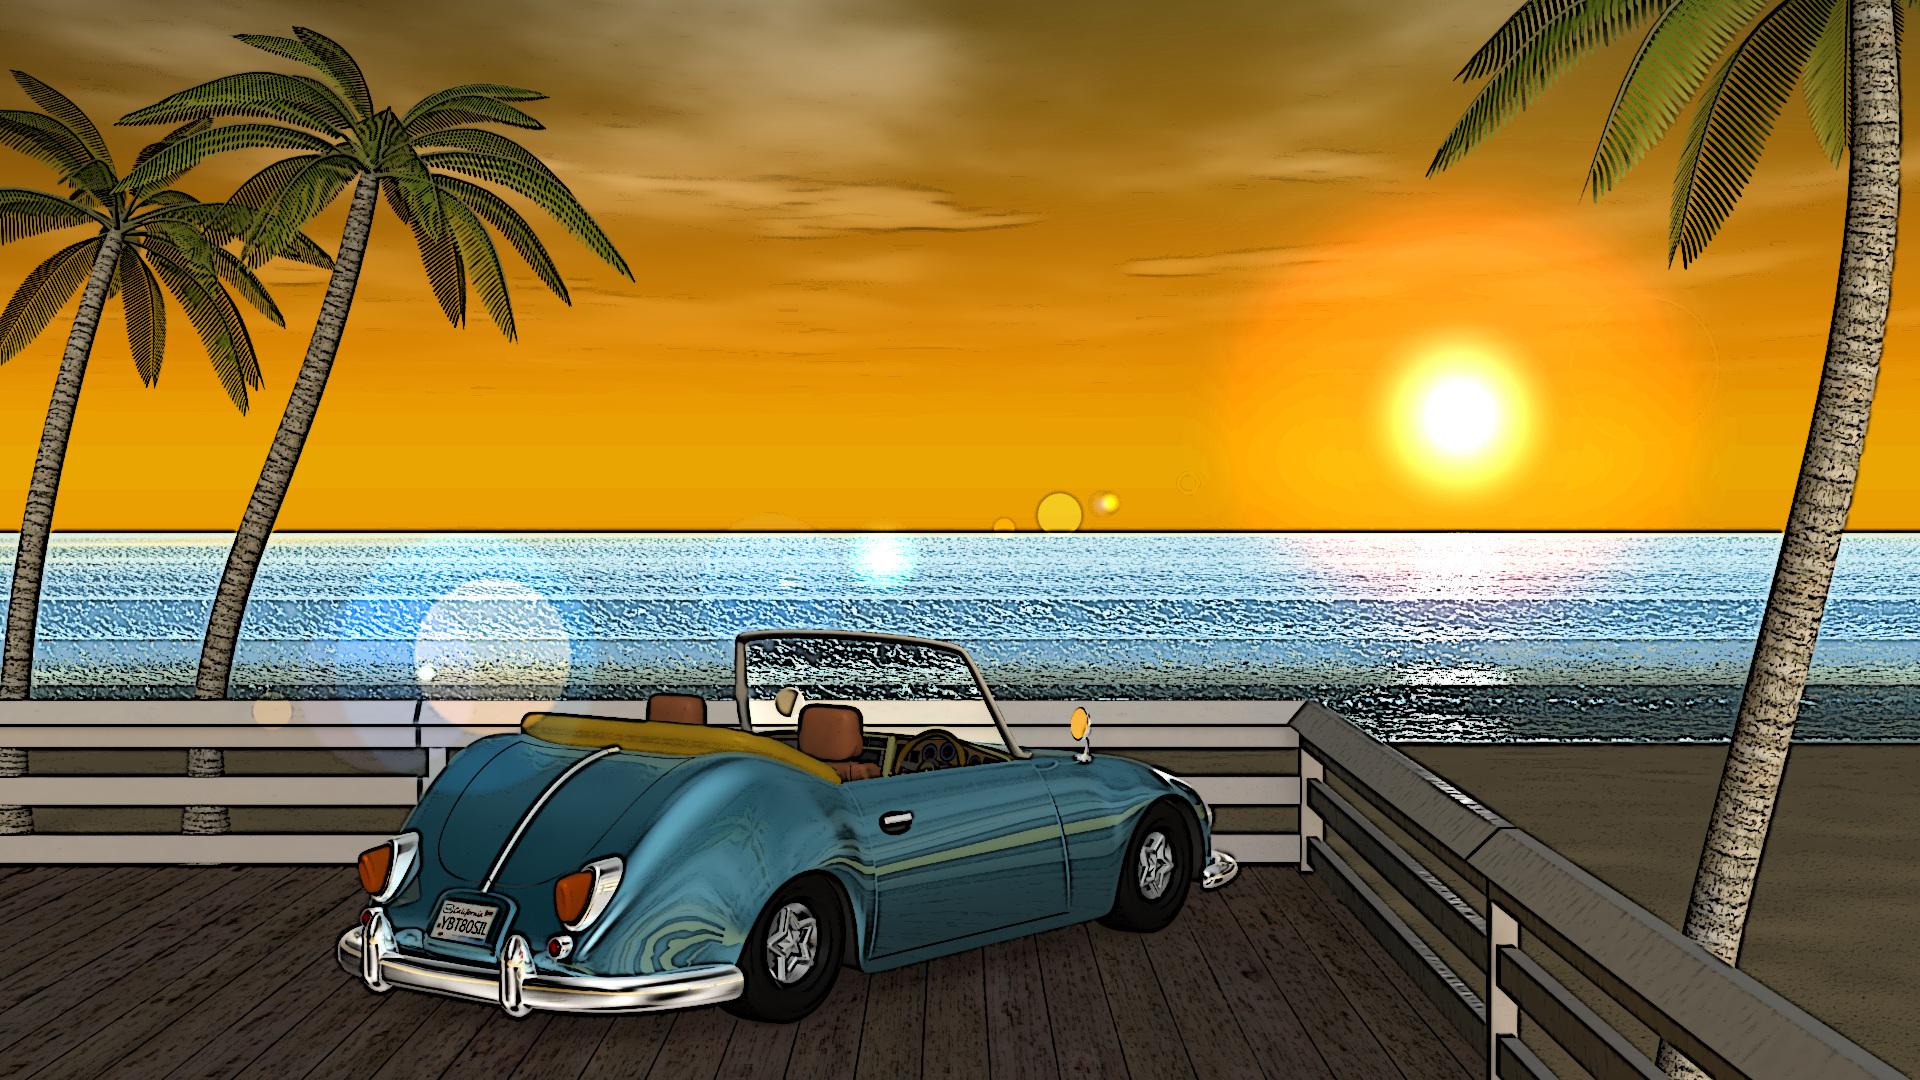 3DCG壁紙 夏の海と椰子の木と車(夕陽)-3